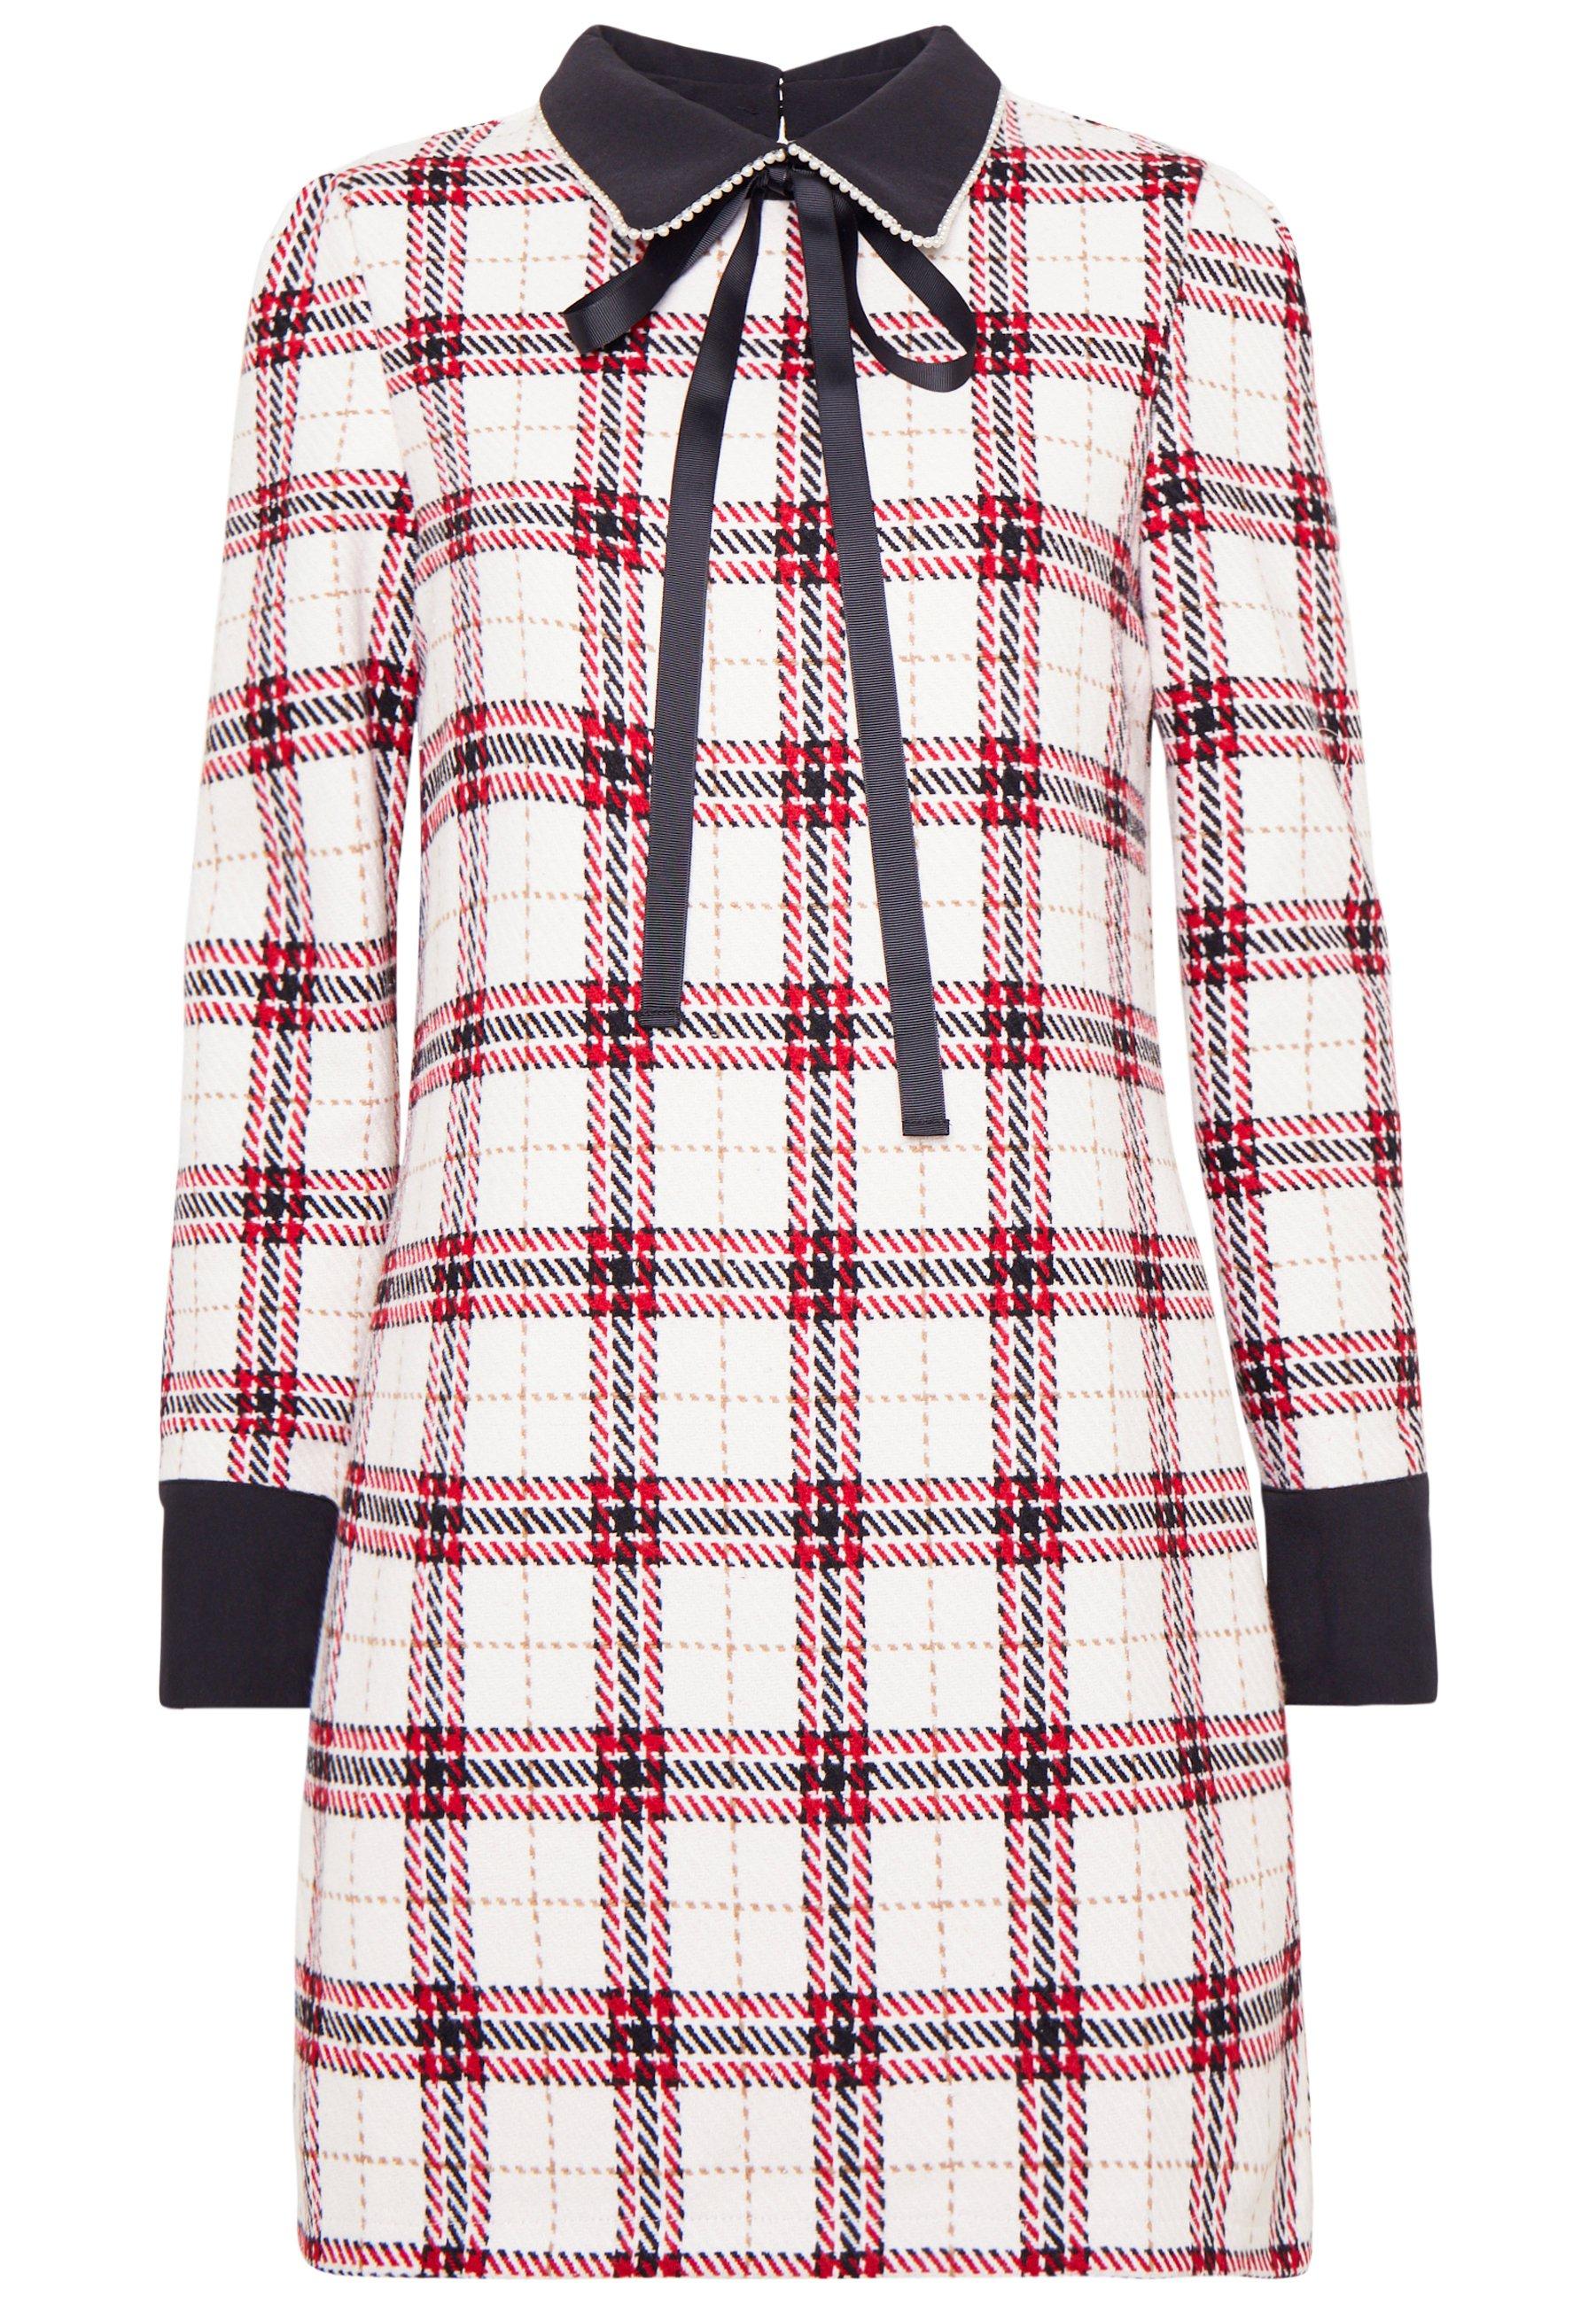 Sister Jane Courtly Check Rabbit Dress - Fodralklänning Multi